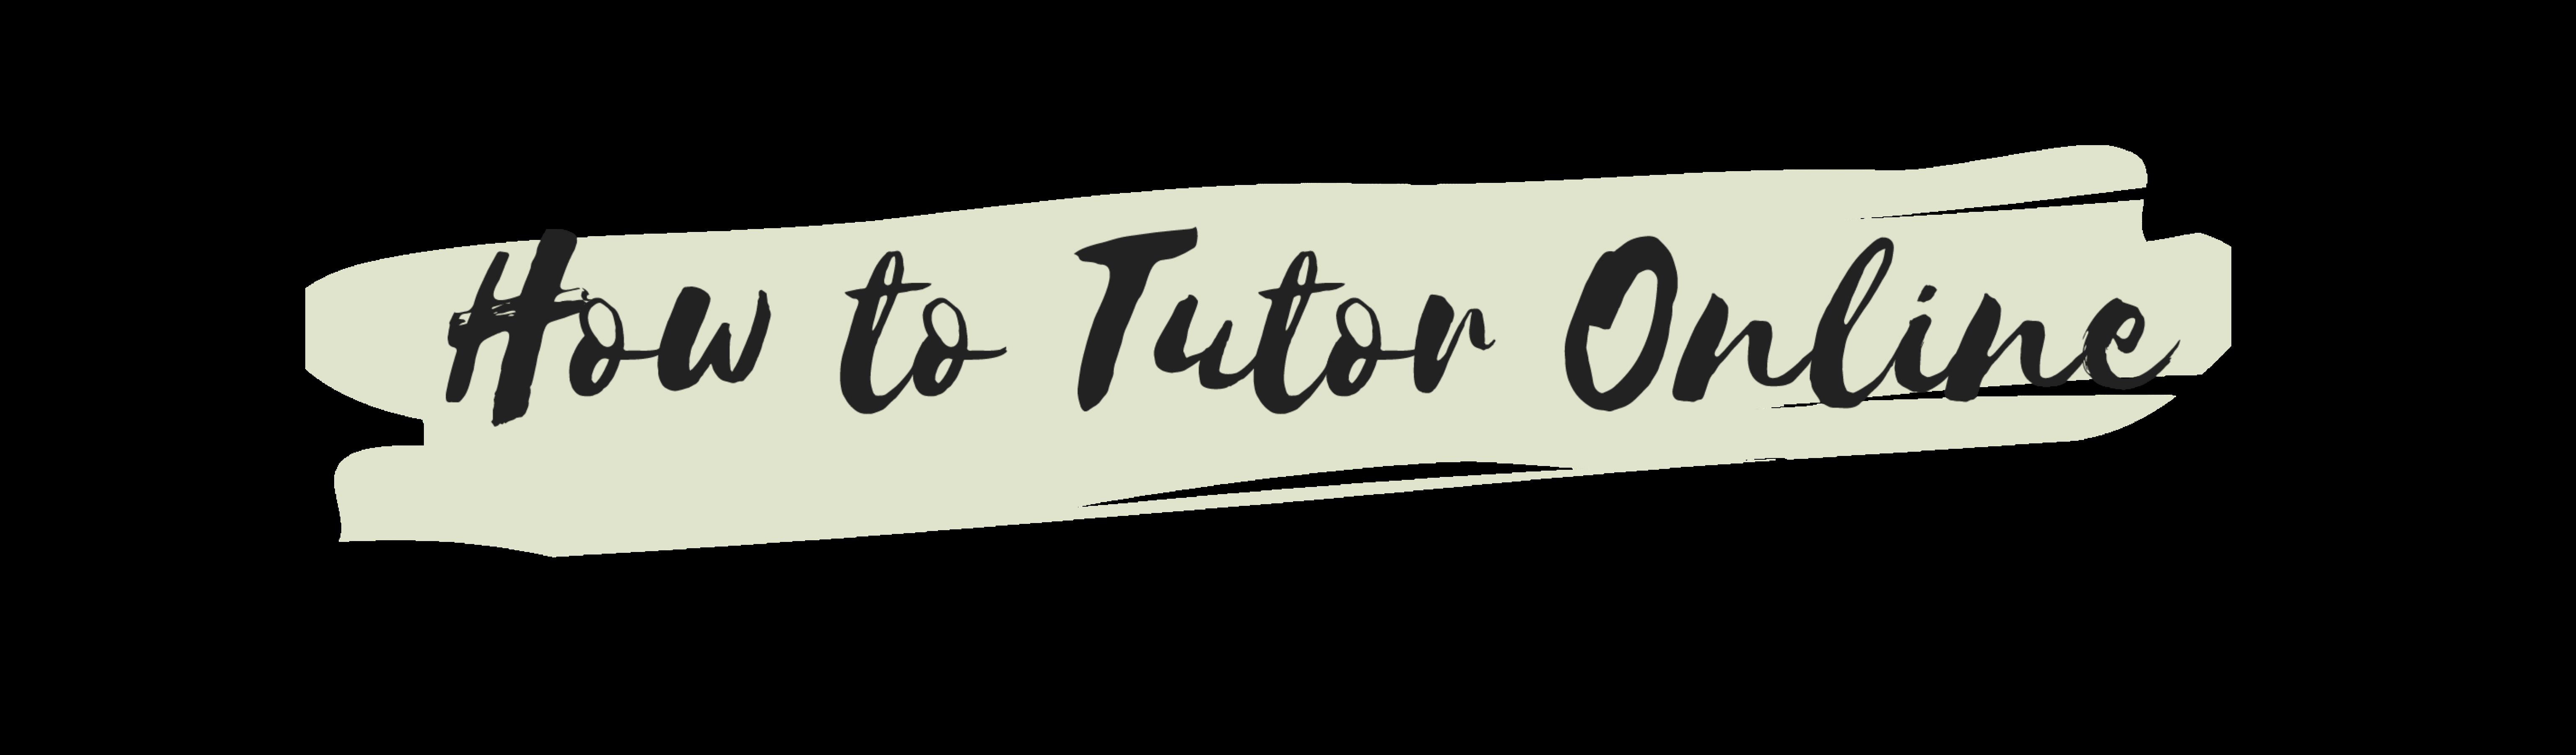 How To Tutor Online